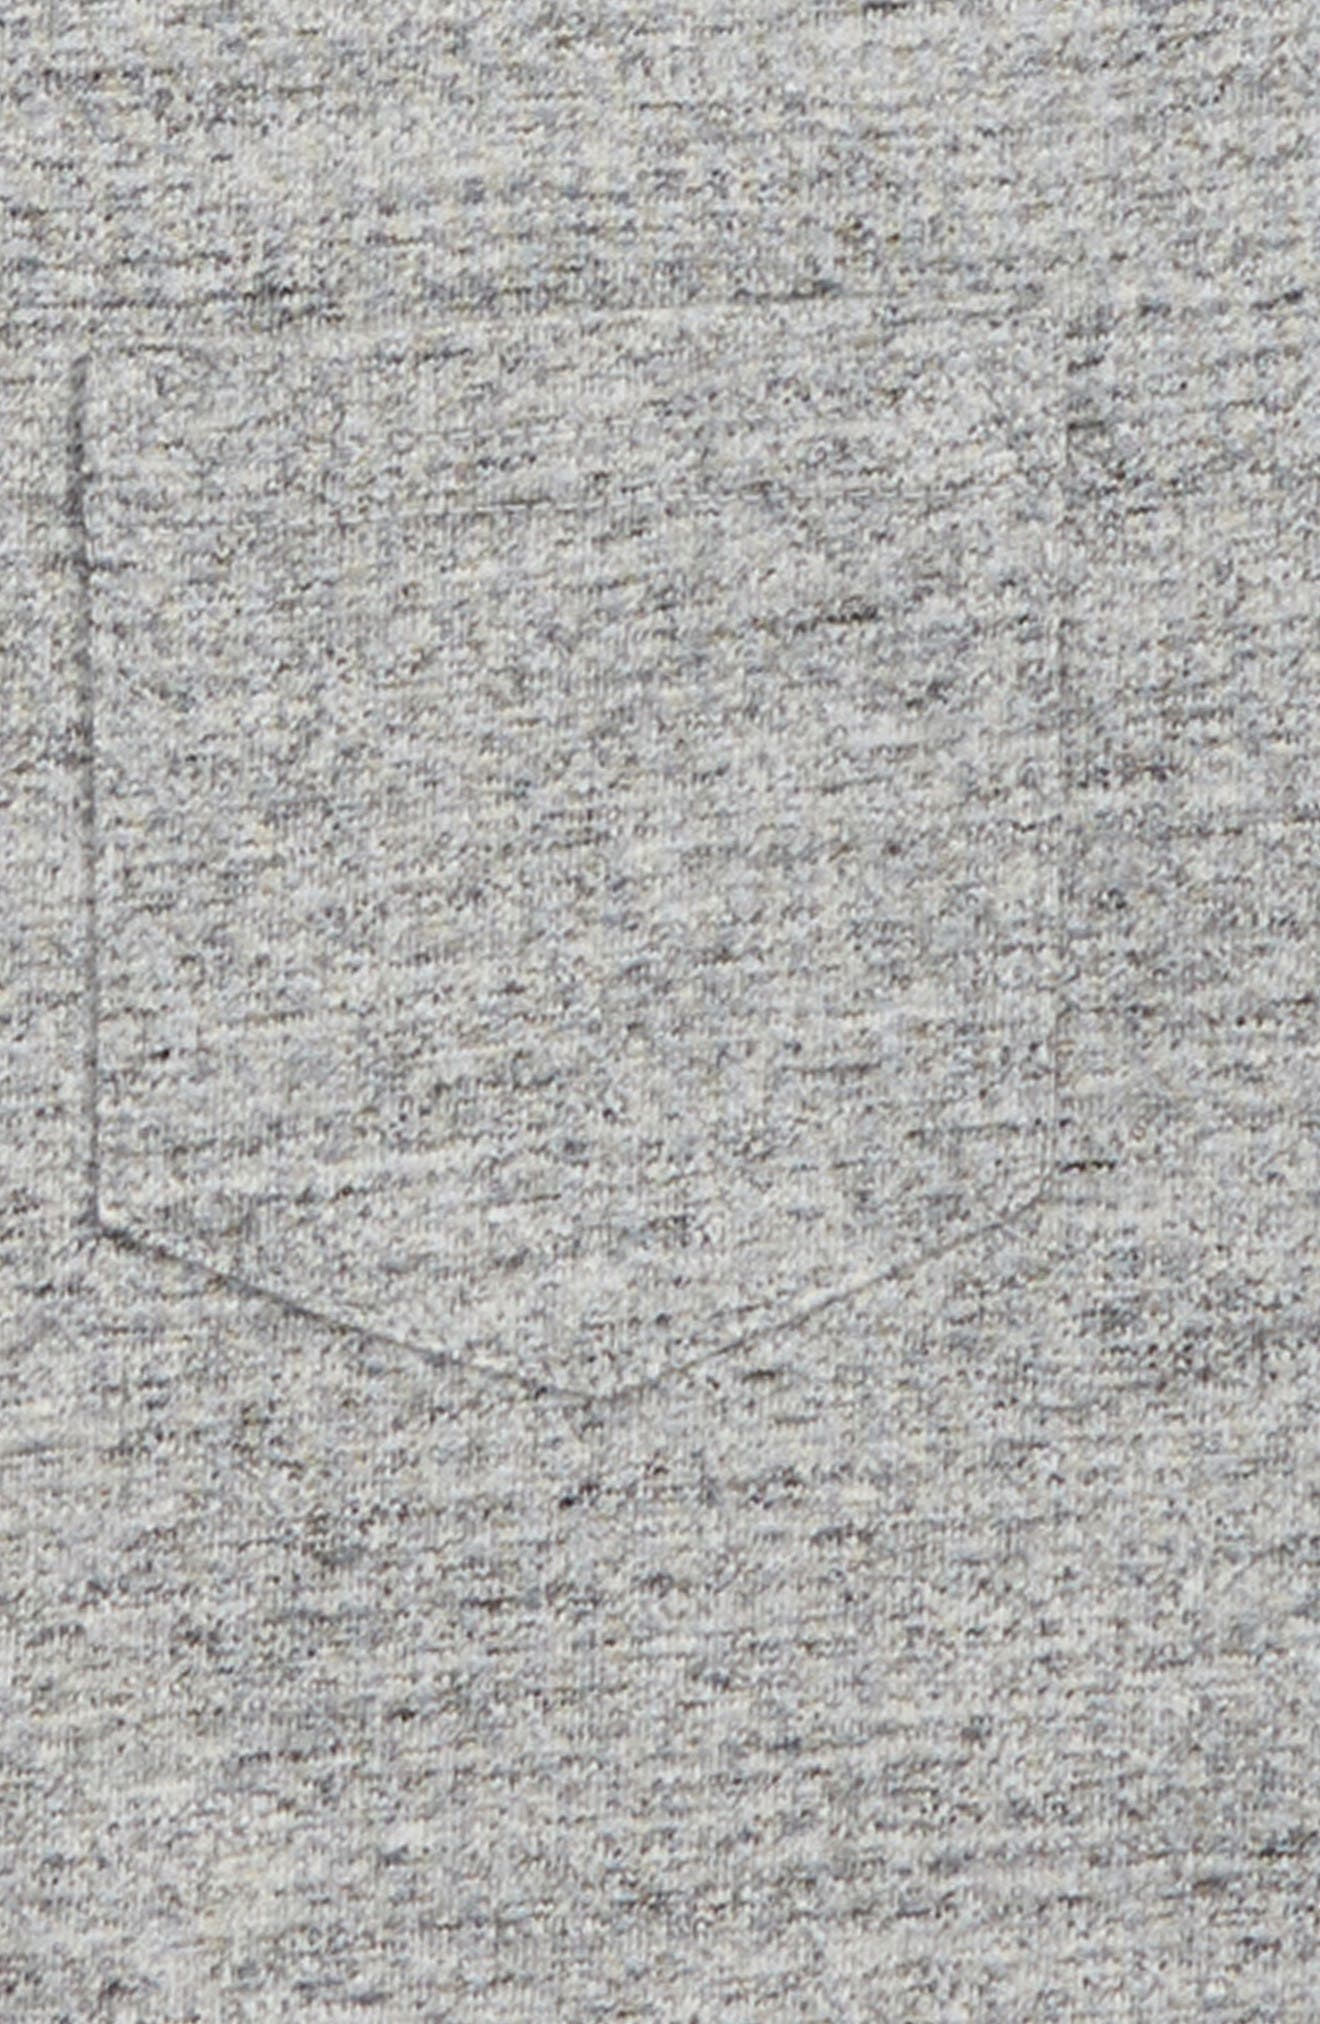 Stripe Raglan Sweatshirt,                             Alternate thumbnail 2, color,                             034